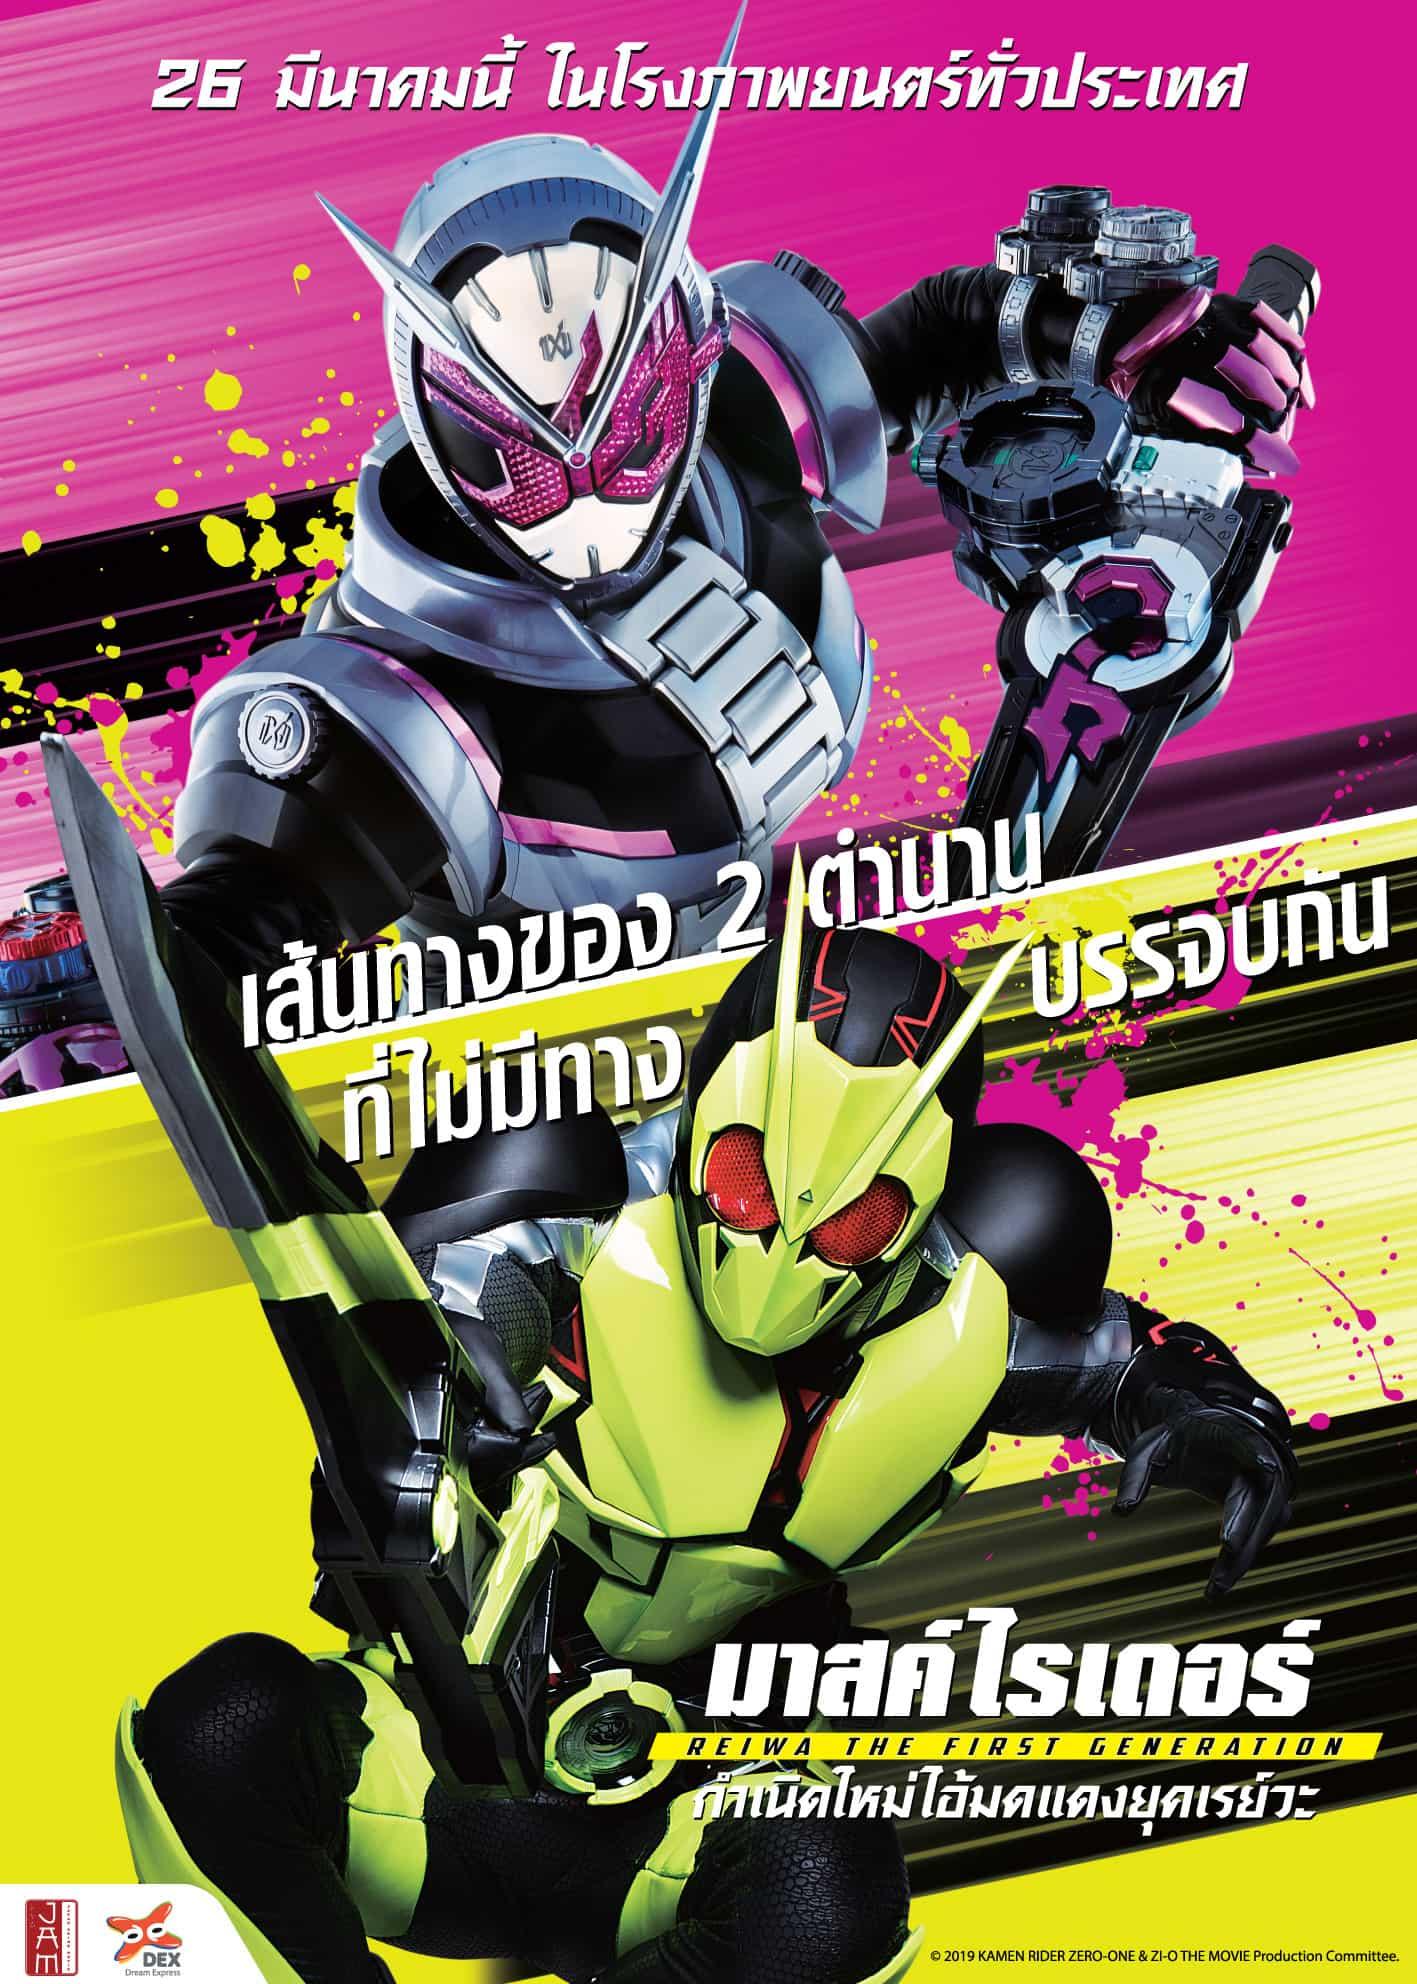 Kamen-Rider-Reiwa-The-First-Generation-2019-มาสค์ไรเดอร์-กำเนิดใหม่ไอ้มดแดงยุคเรวะ-พากย์ไทย-min